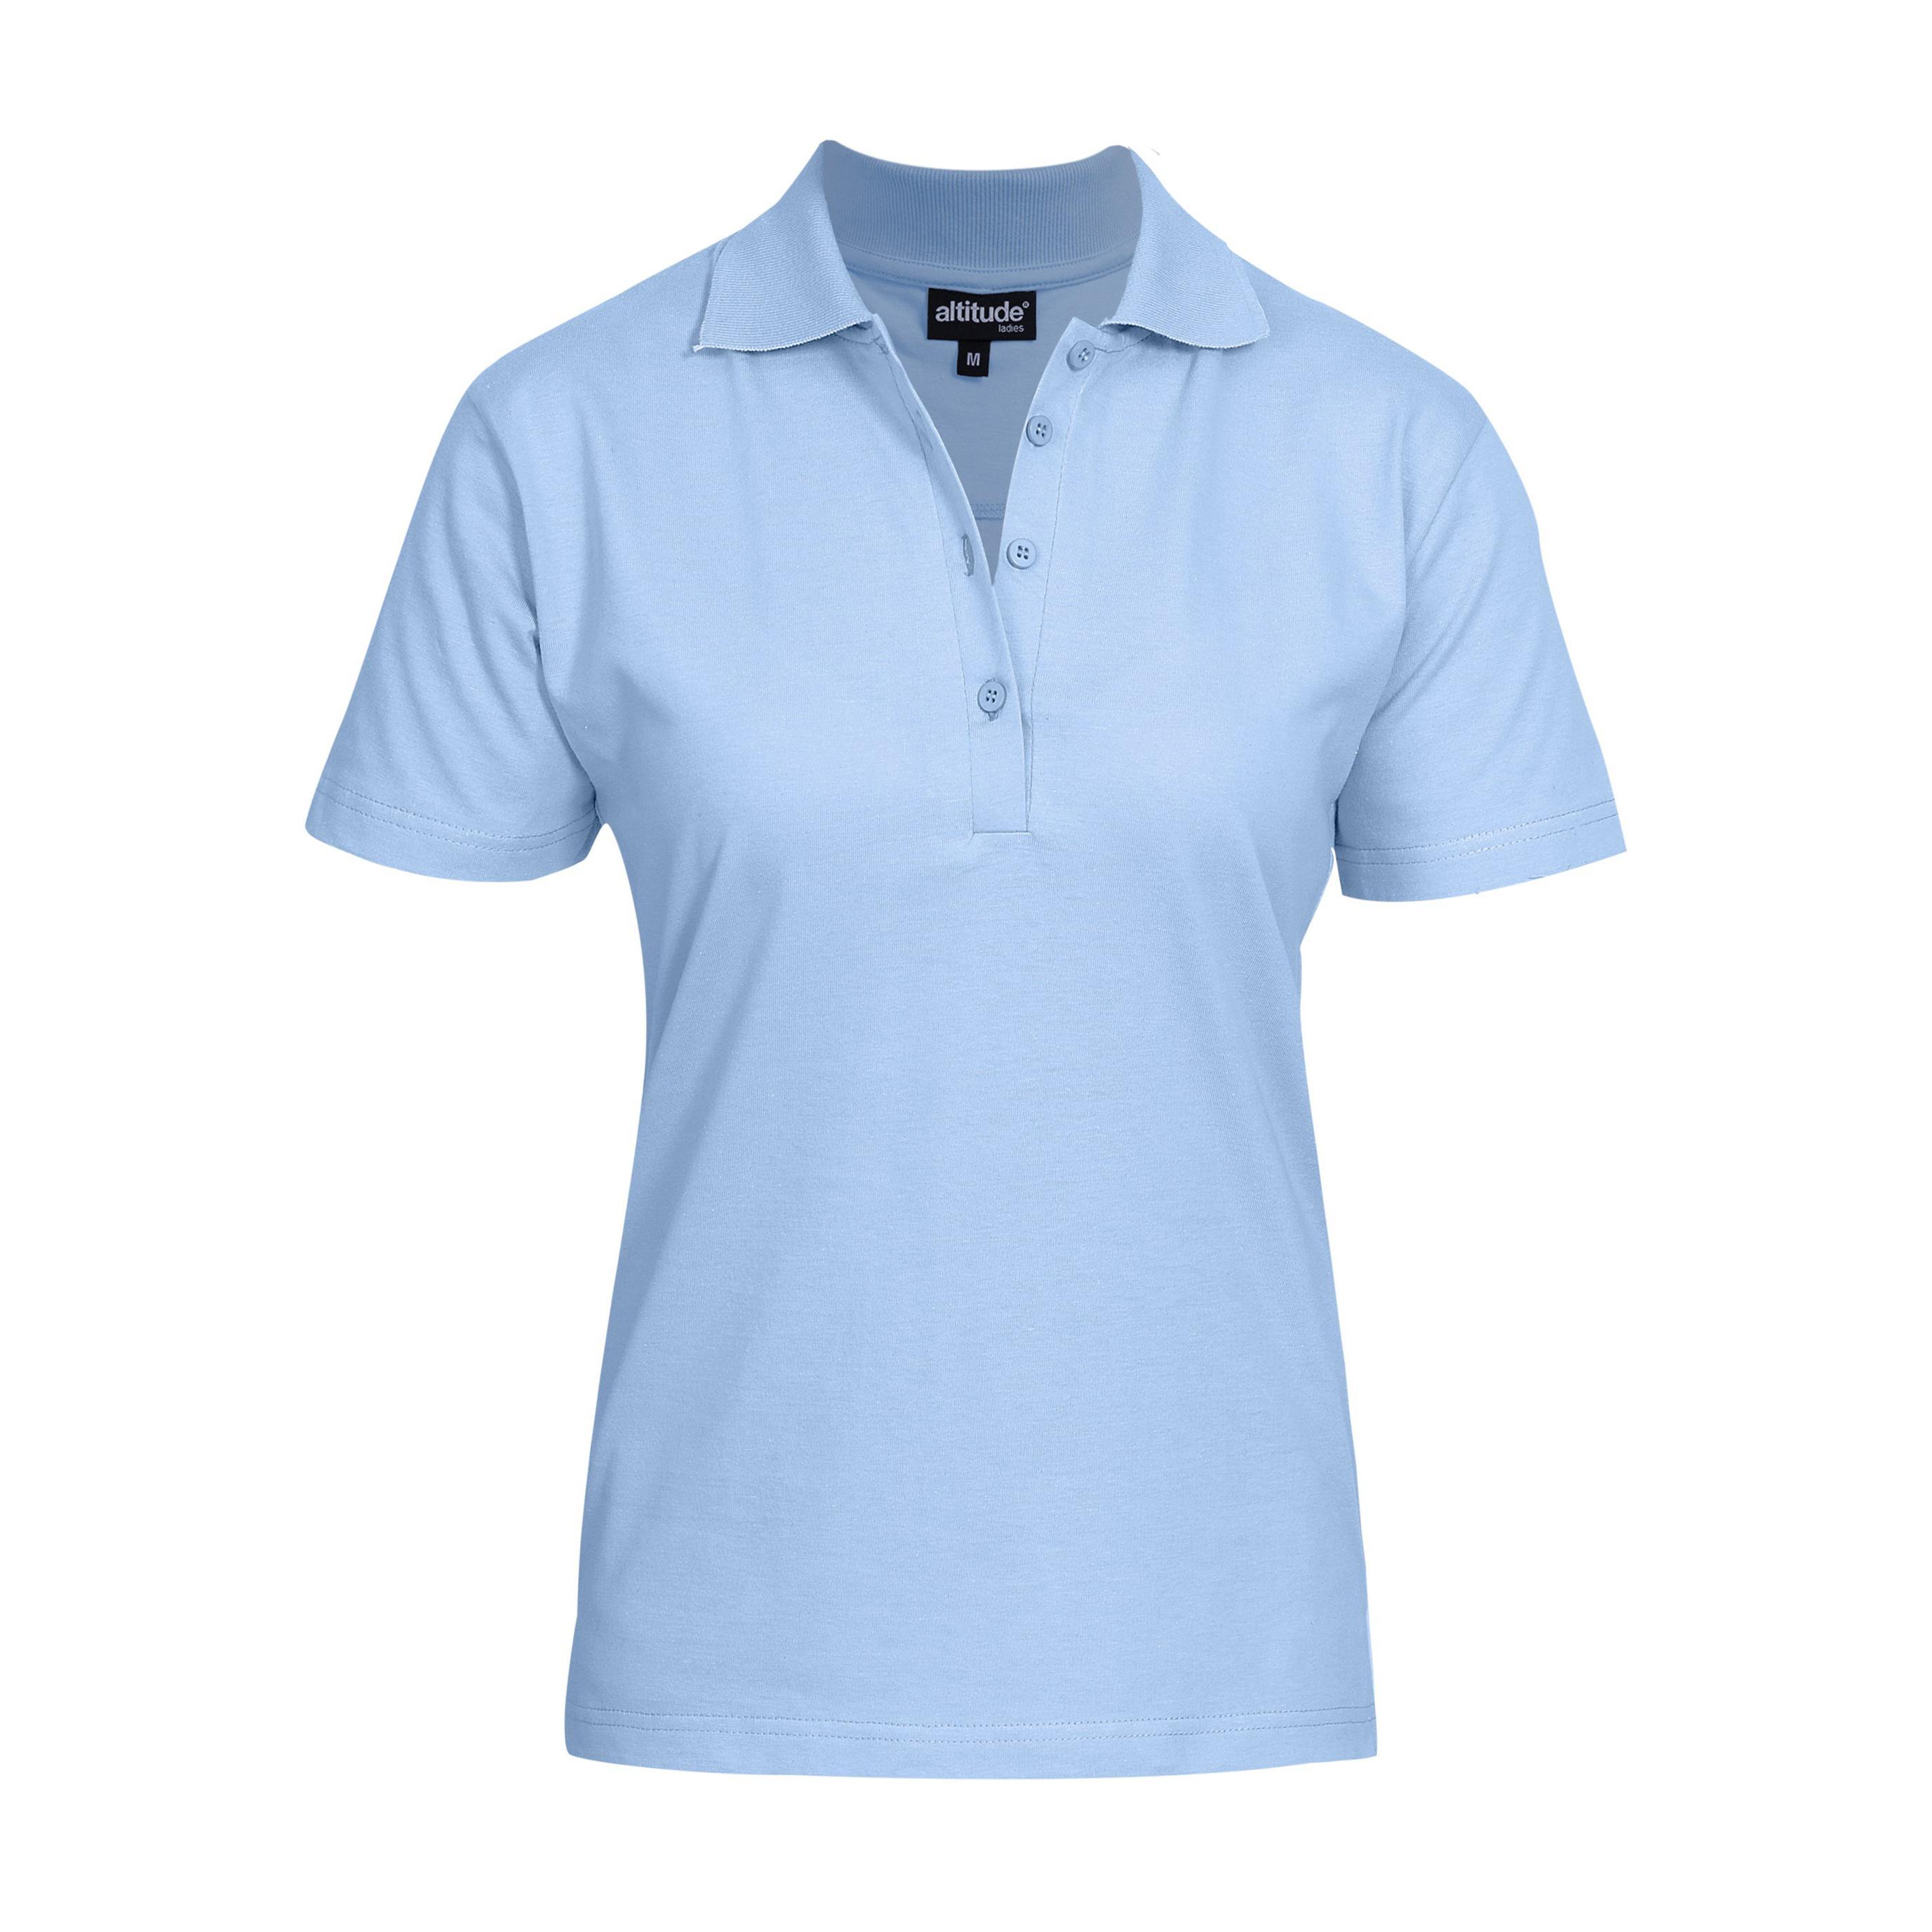 Ladies Michigan Golf Shirt - Light Blue Only